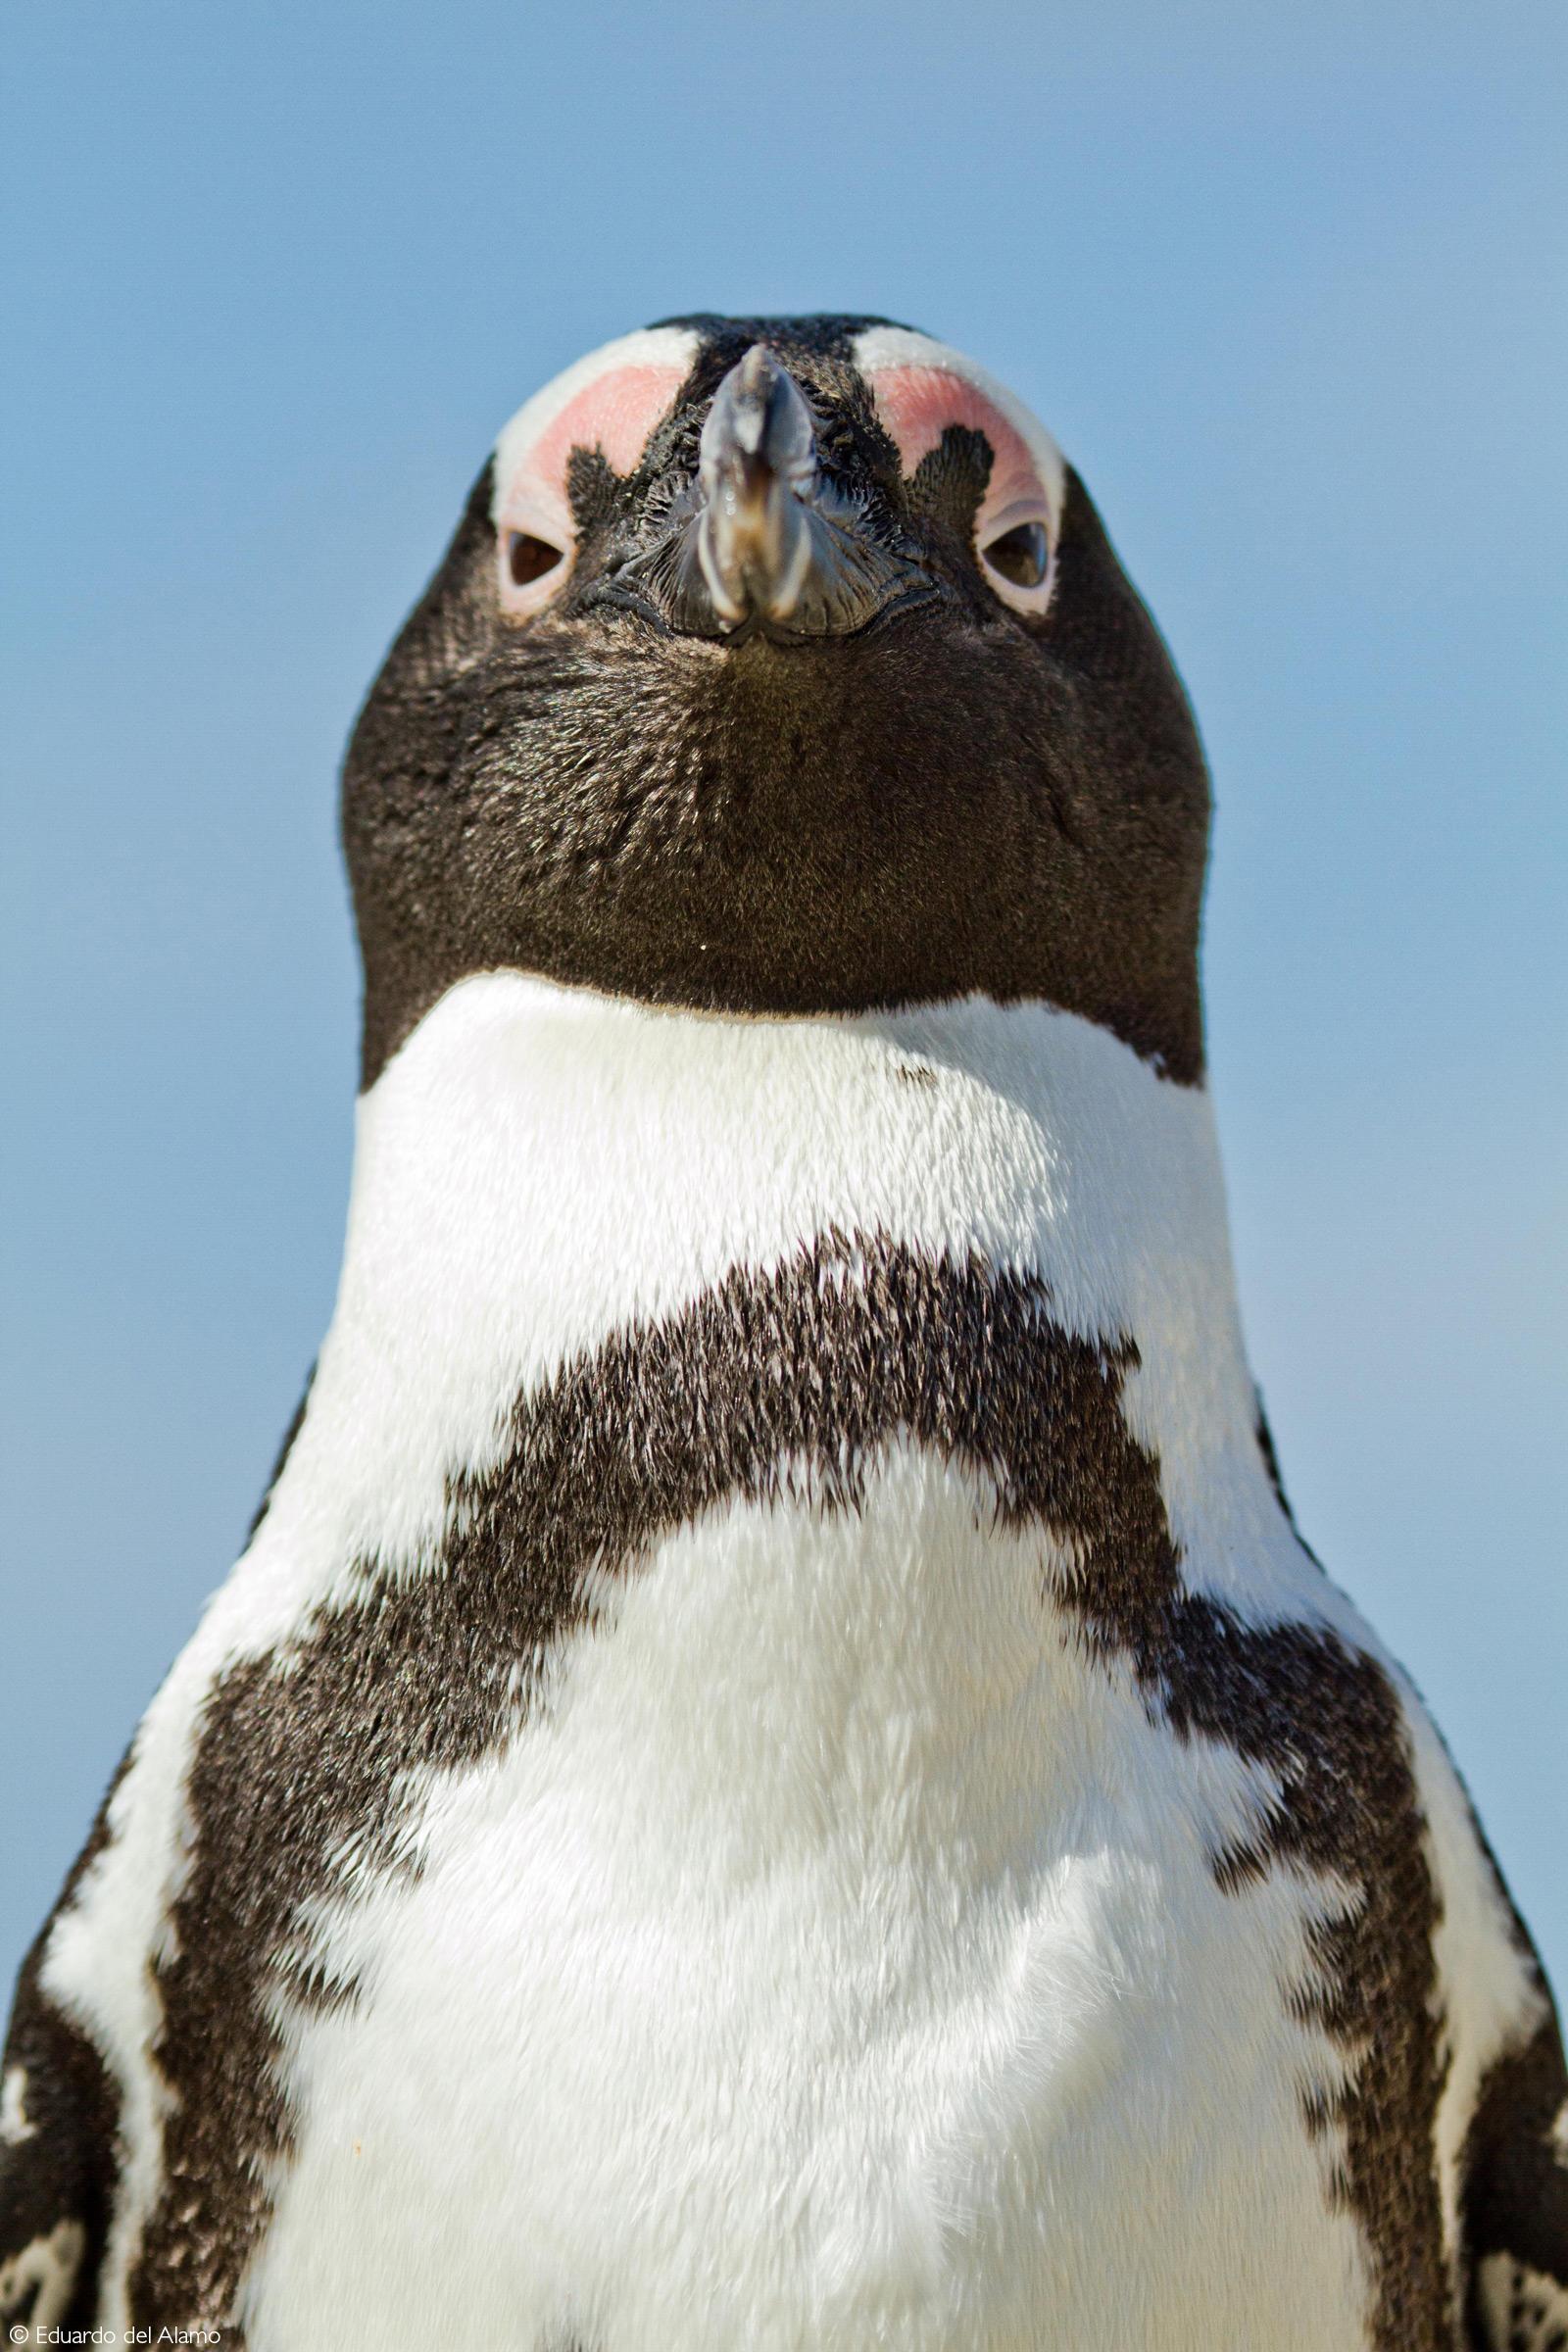 An African penguin. Betty's Bay, South Africa © Eduardo del Alamo